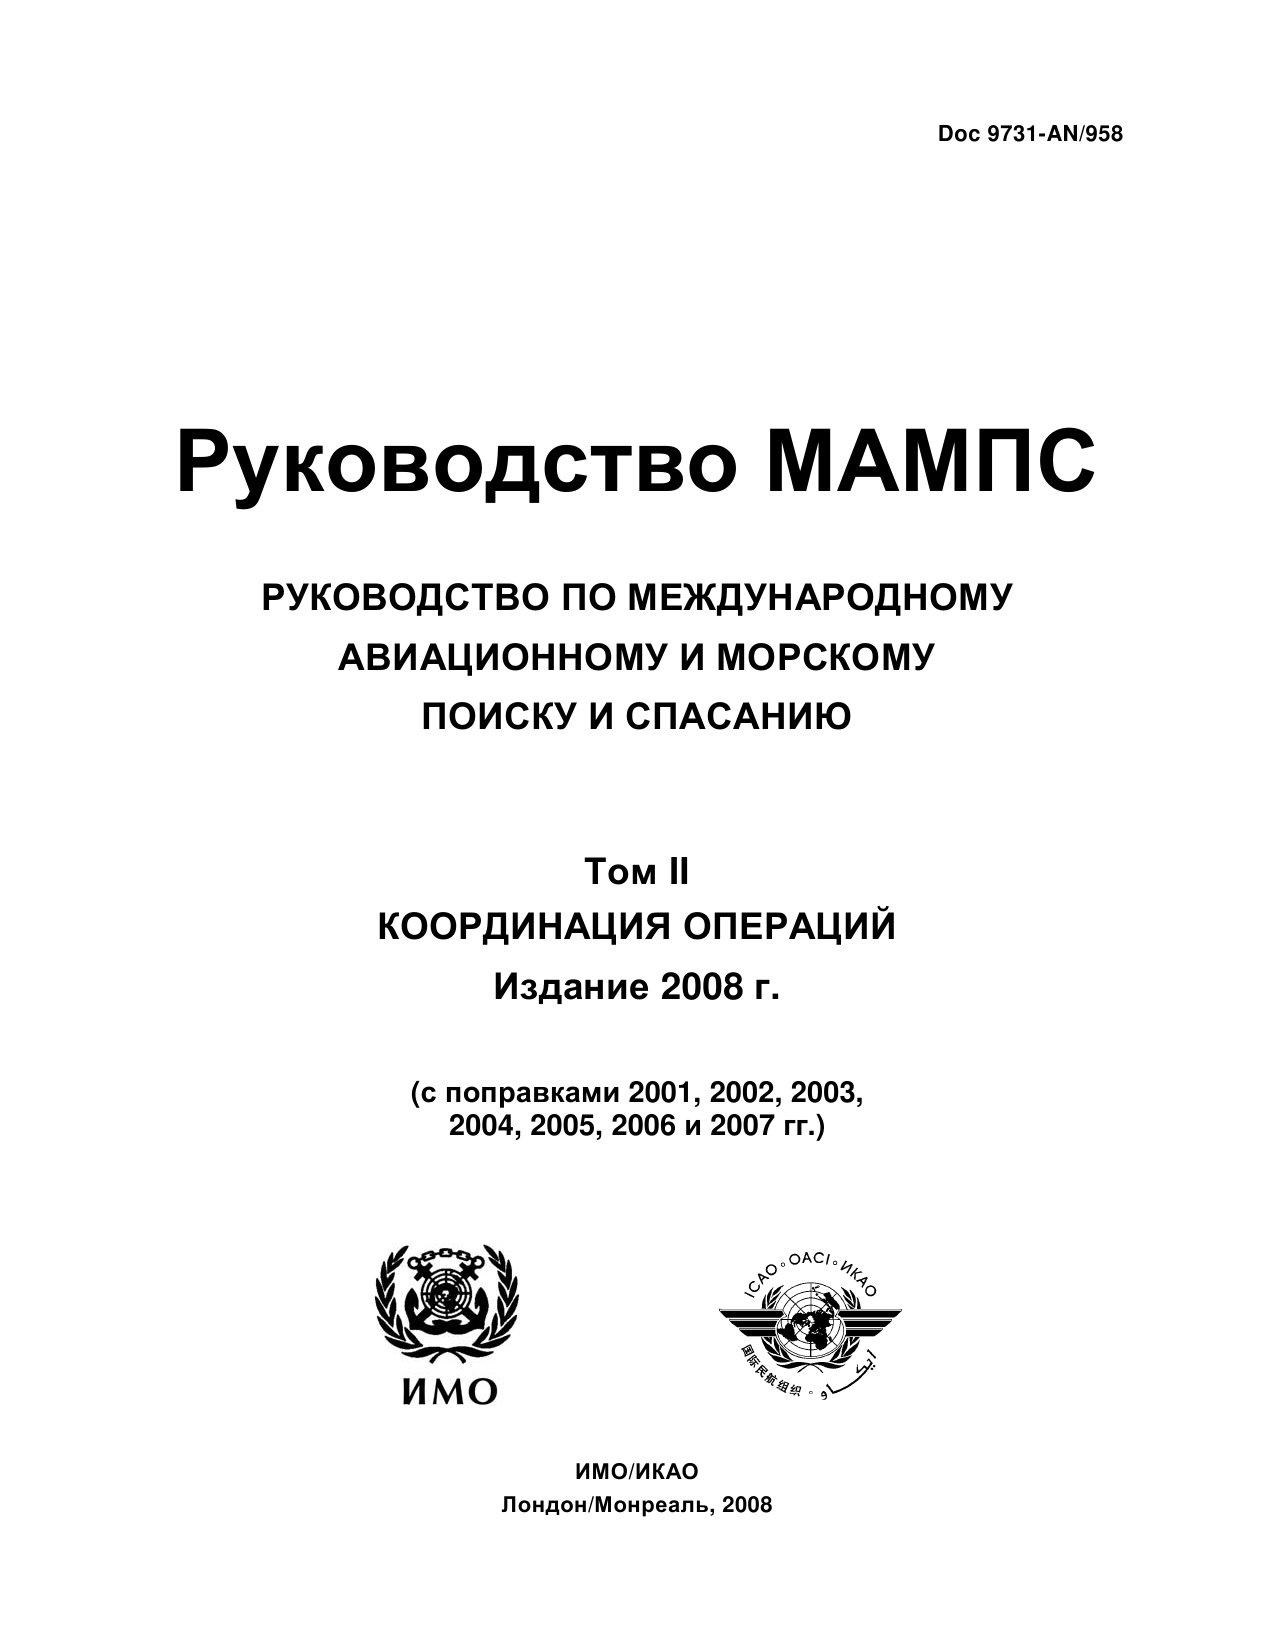 ICAO Doc 9731 Руководство по международному авиационному и морскому поиску и спасанию (МАМПС). Том II. Координация операций.